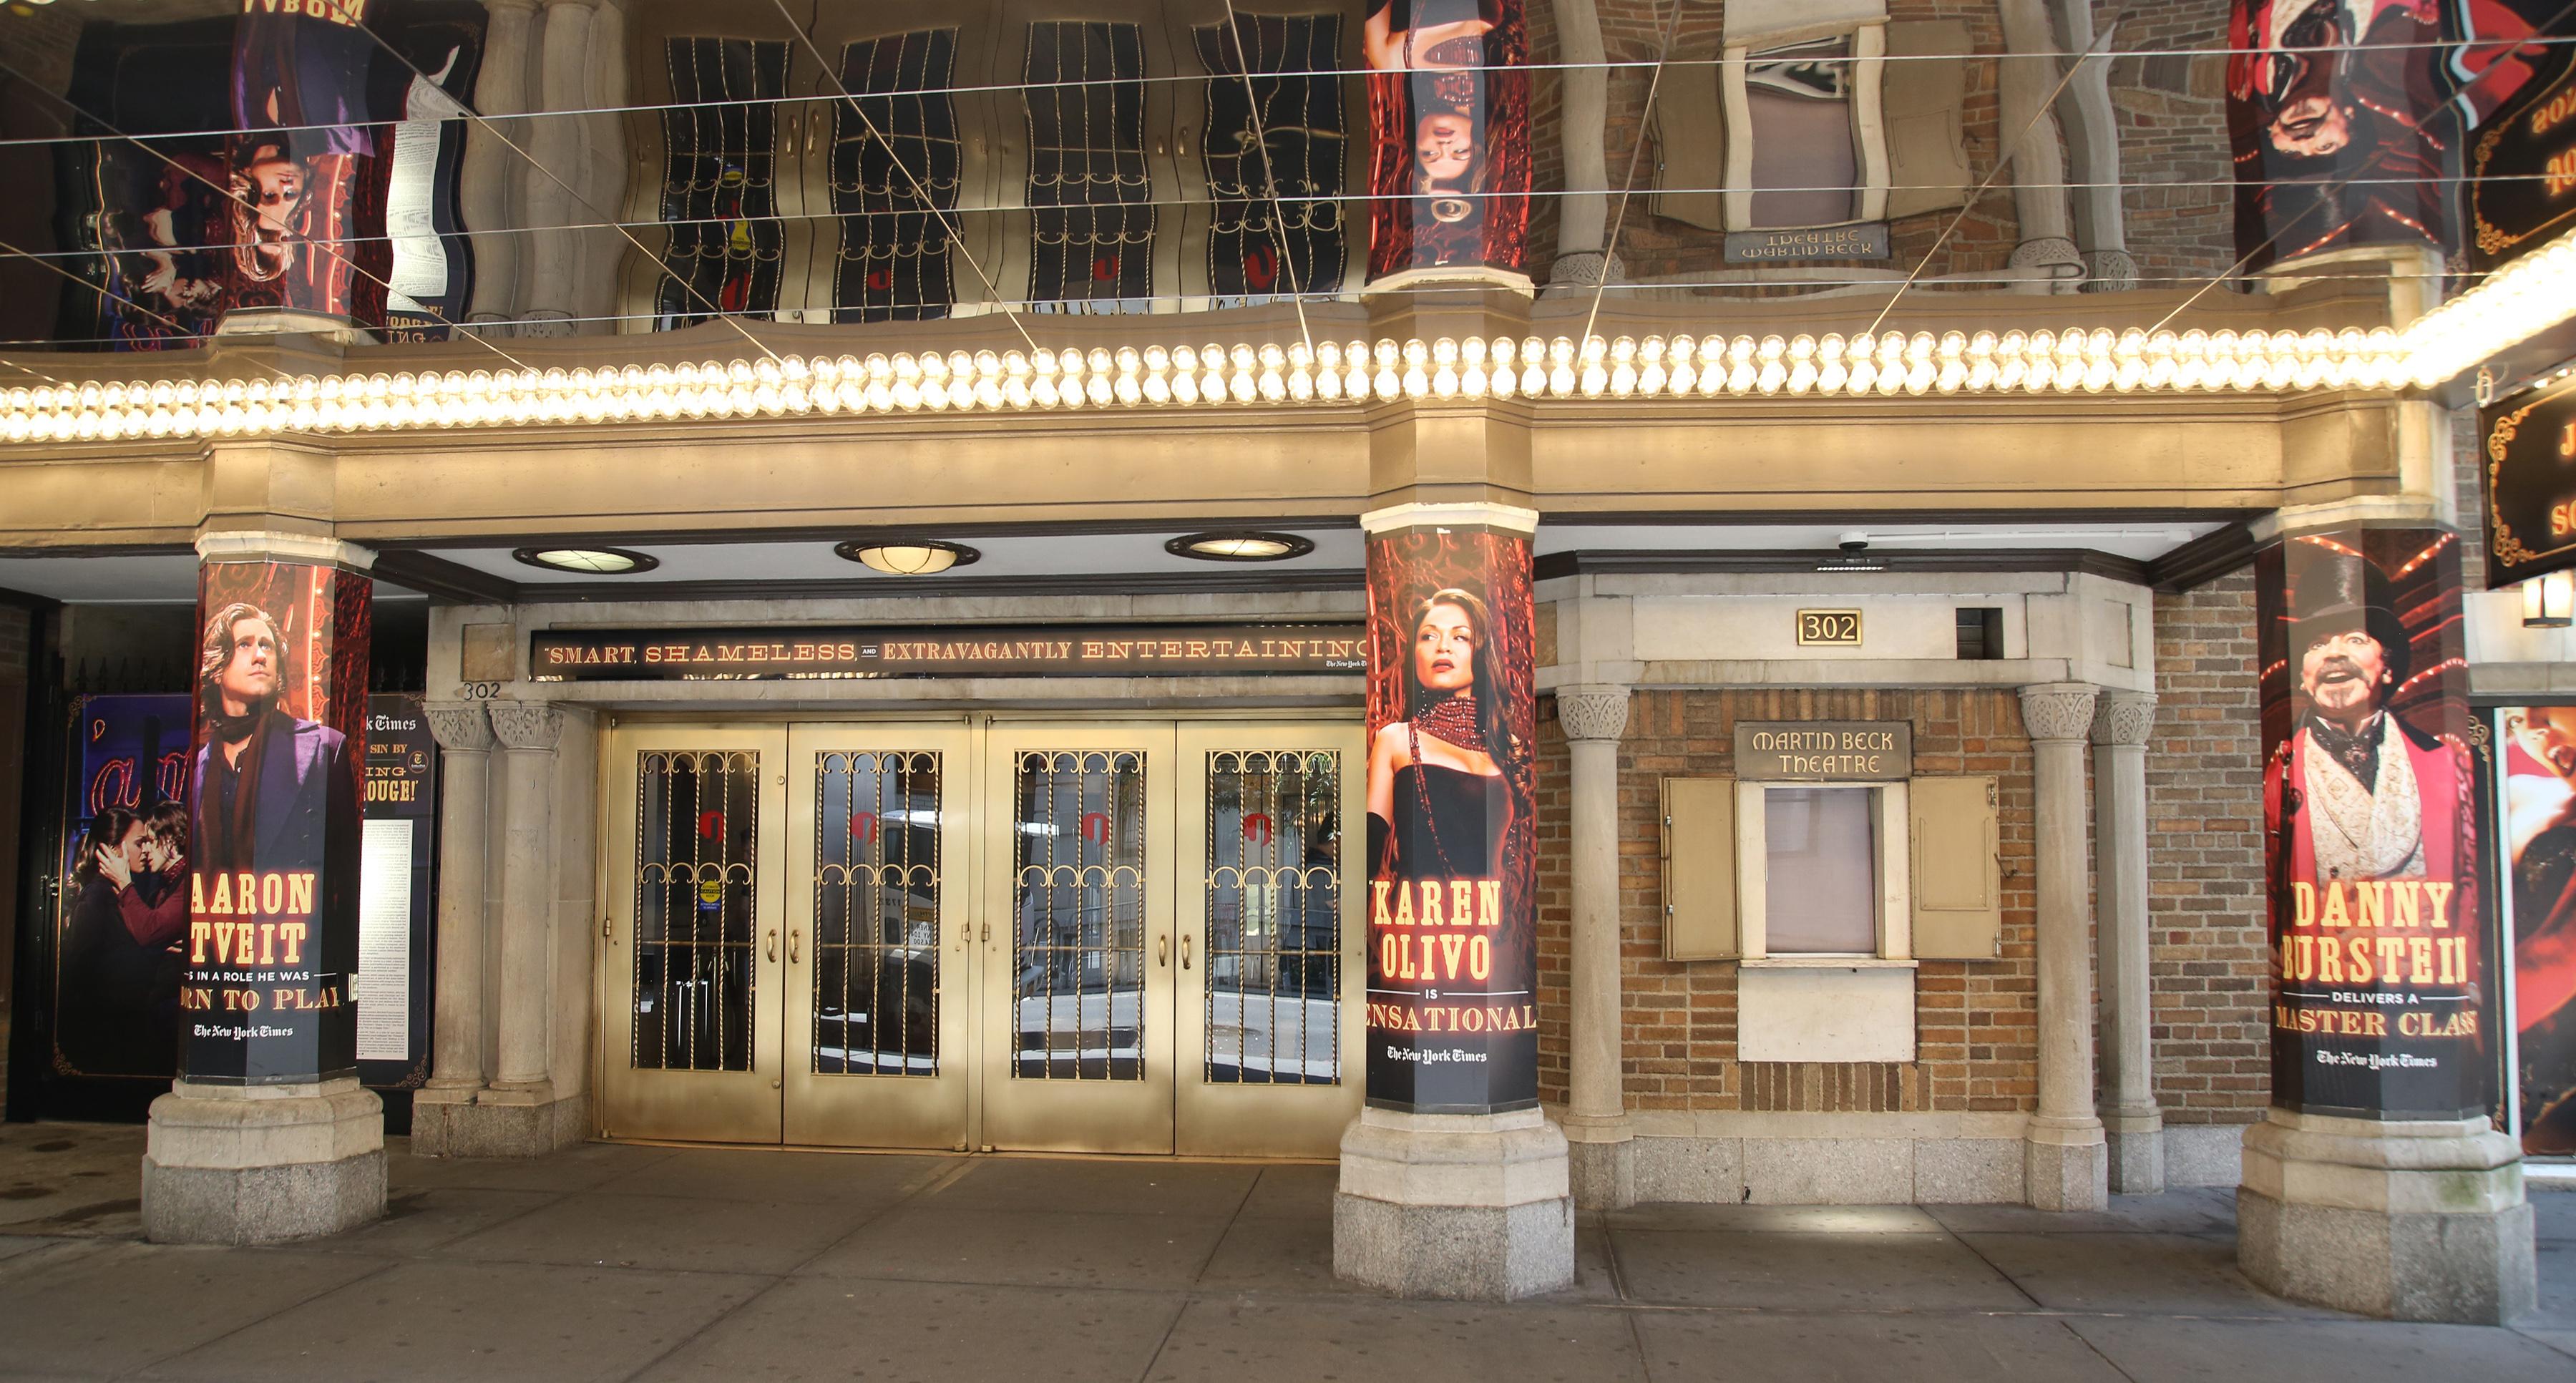 Al Hirschfeld Theatre (Broadway) - Theater Information Marquee